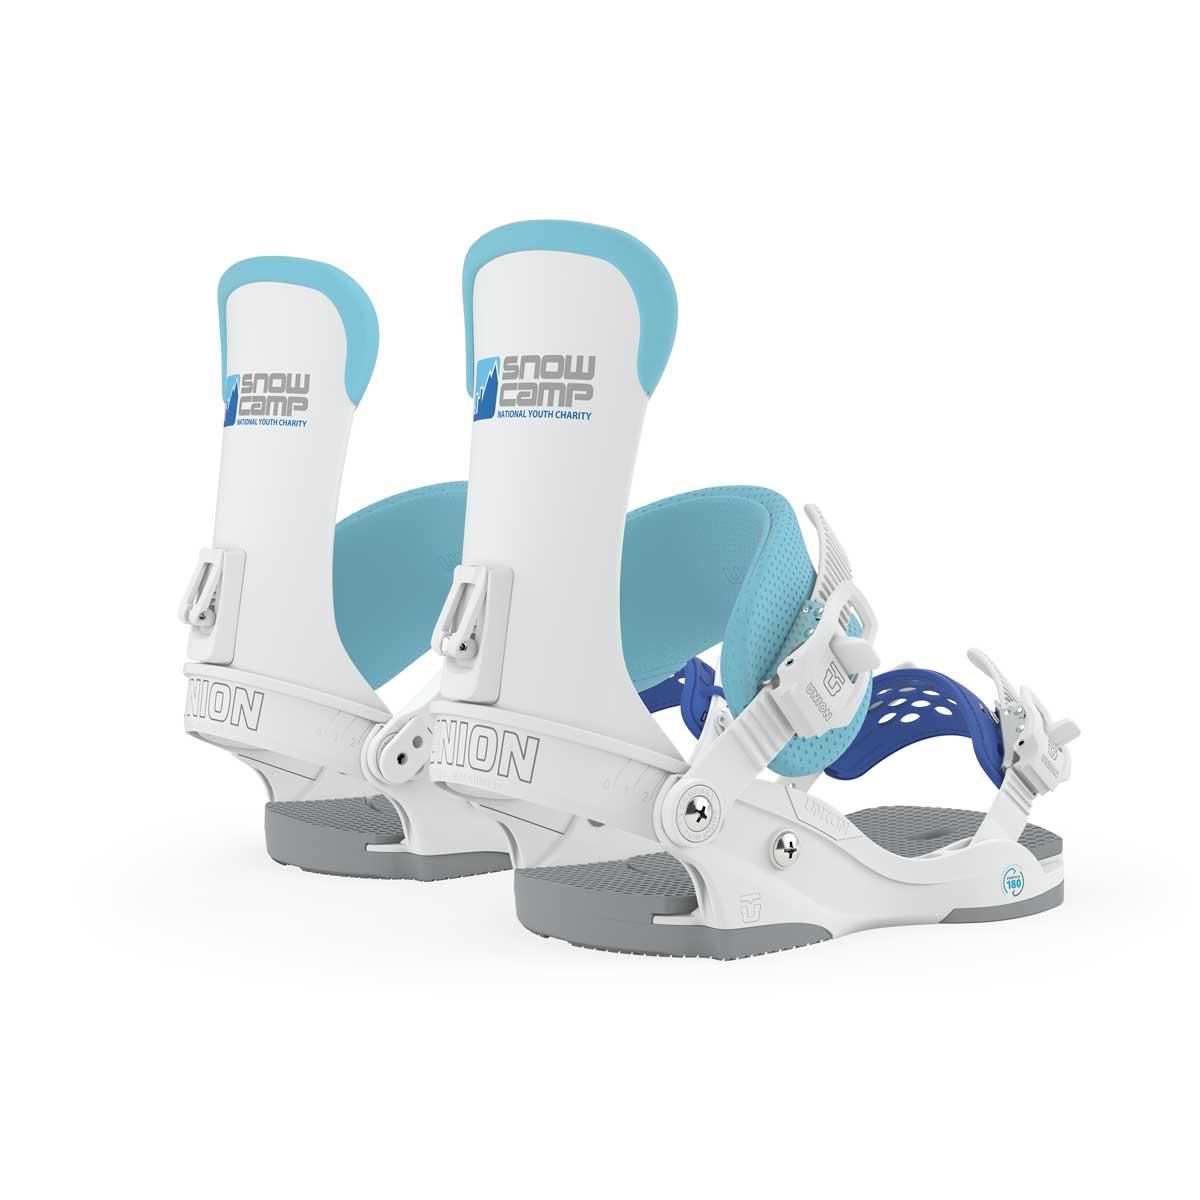 b69408313227 Union Snow Camp UK Custom House Snowboard Bindings 2019